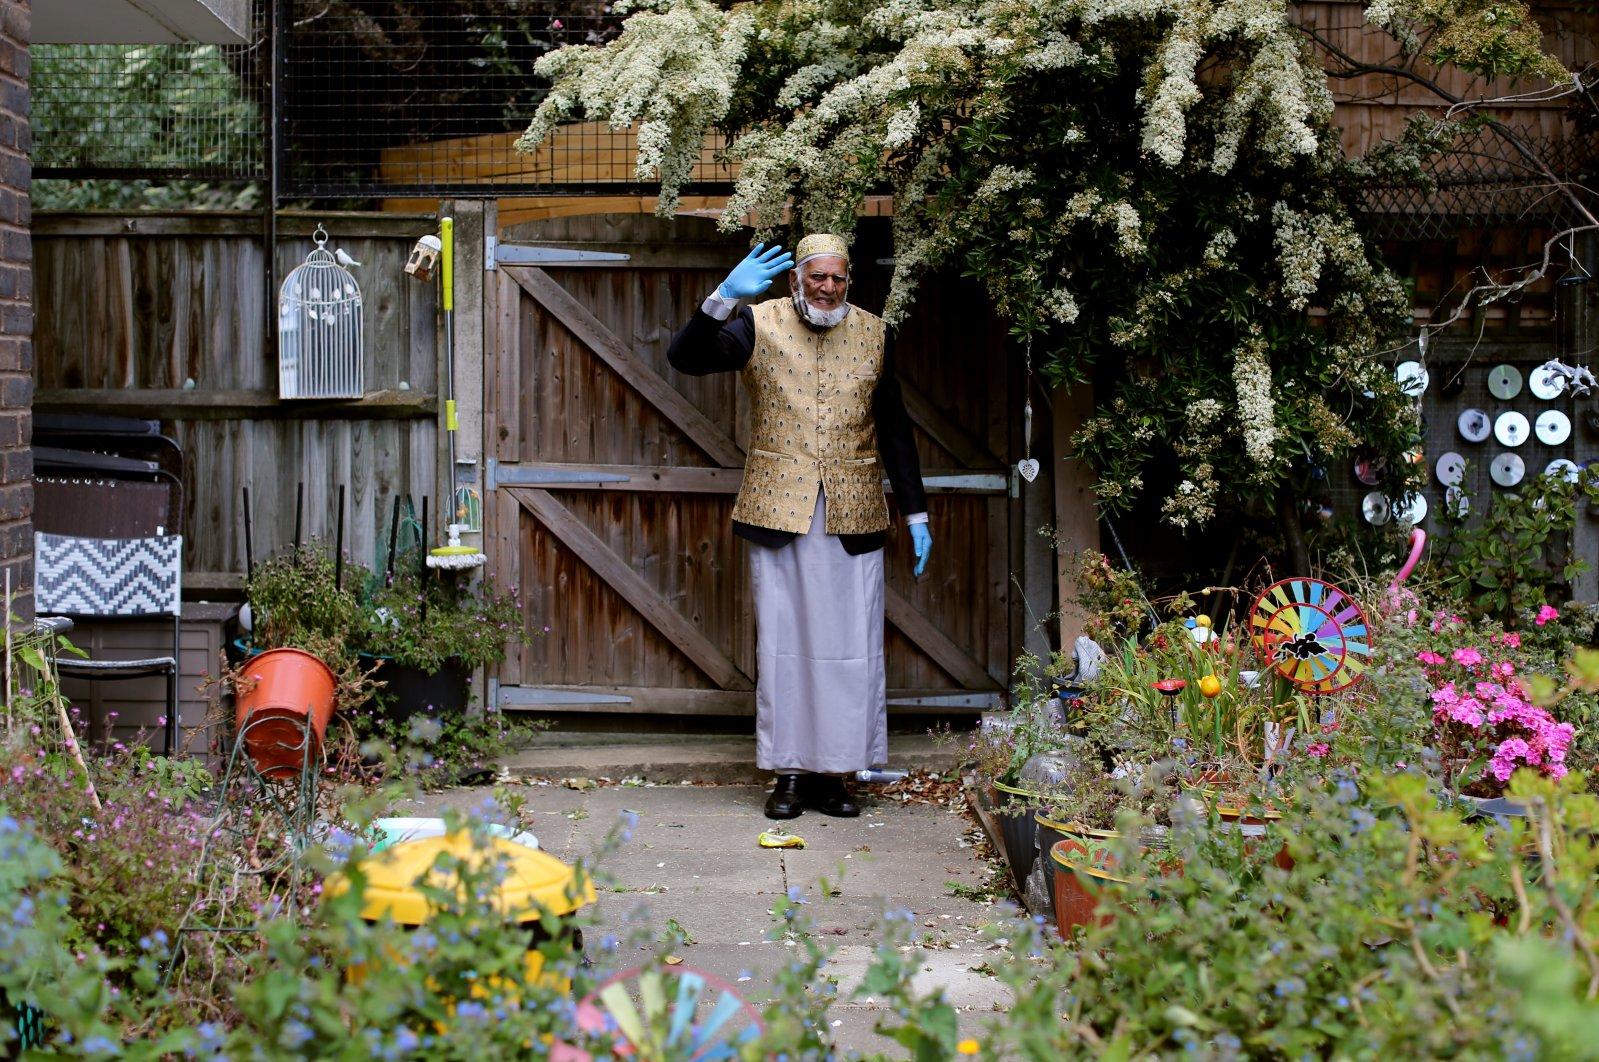 Dabirul Islam Choudhury poses in his 80-meter garden in London, May 23, 2020. (AA Photo)